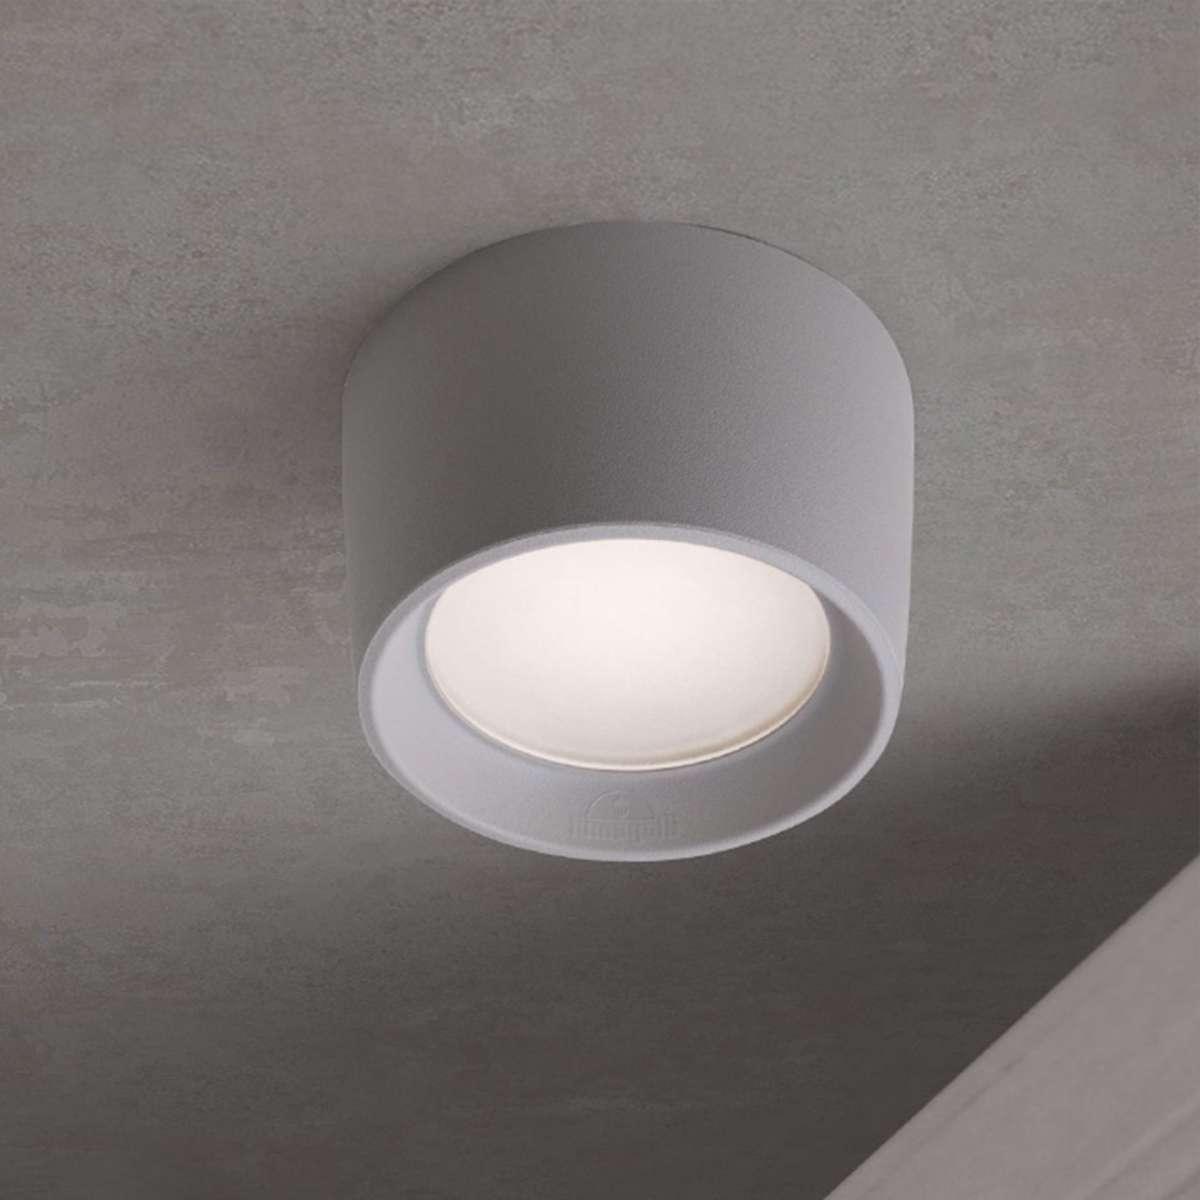 Fumagalli LIVIA160GY Livia 160 Grey LED 7W 4000K Ceiling Down Light